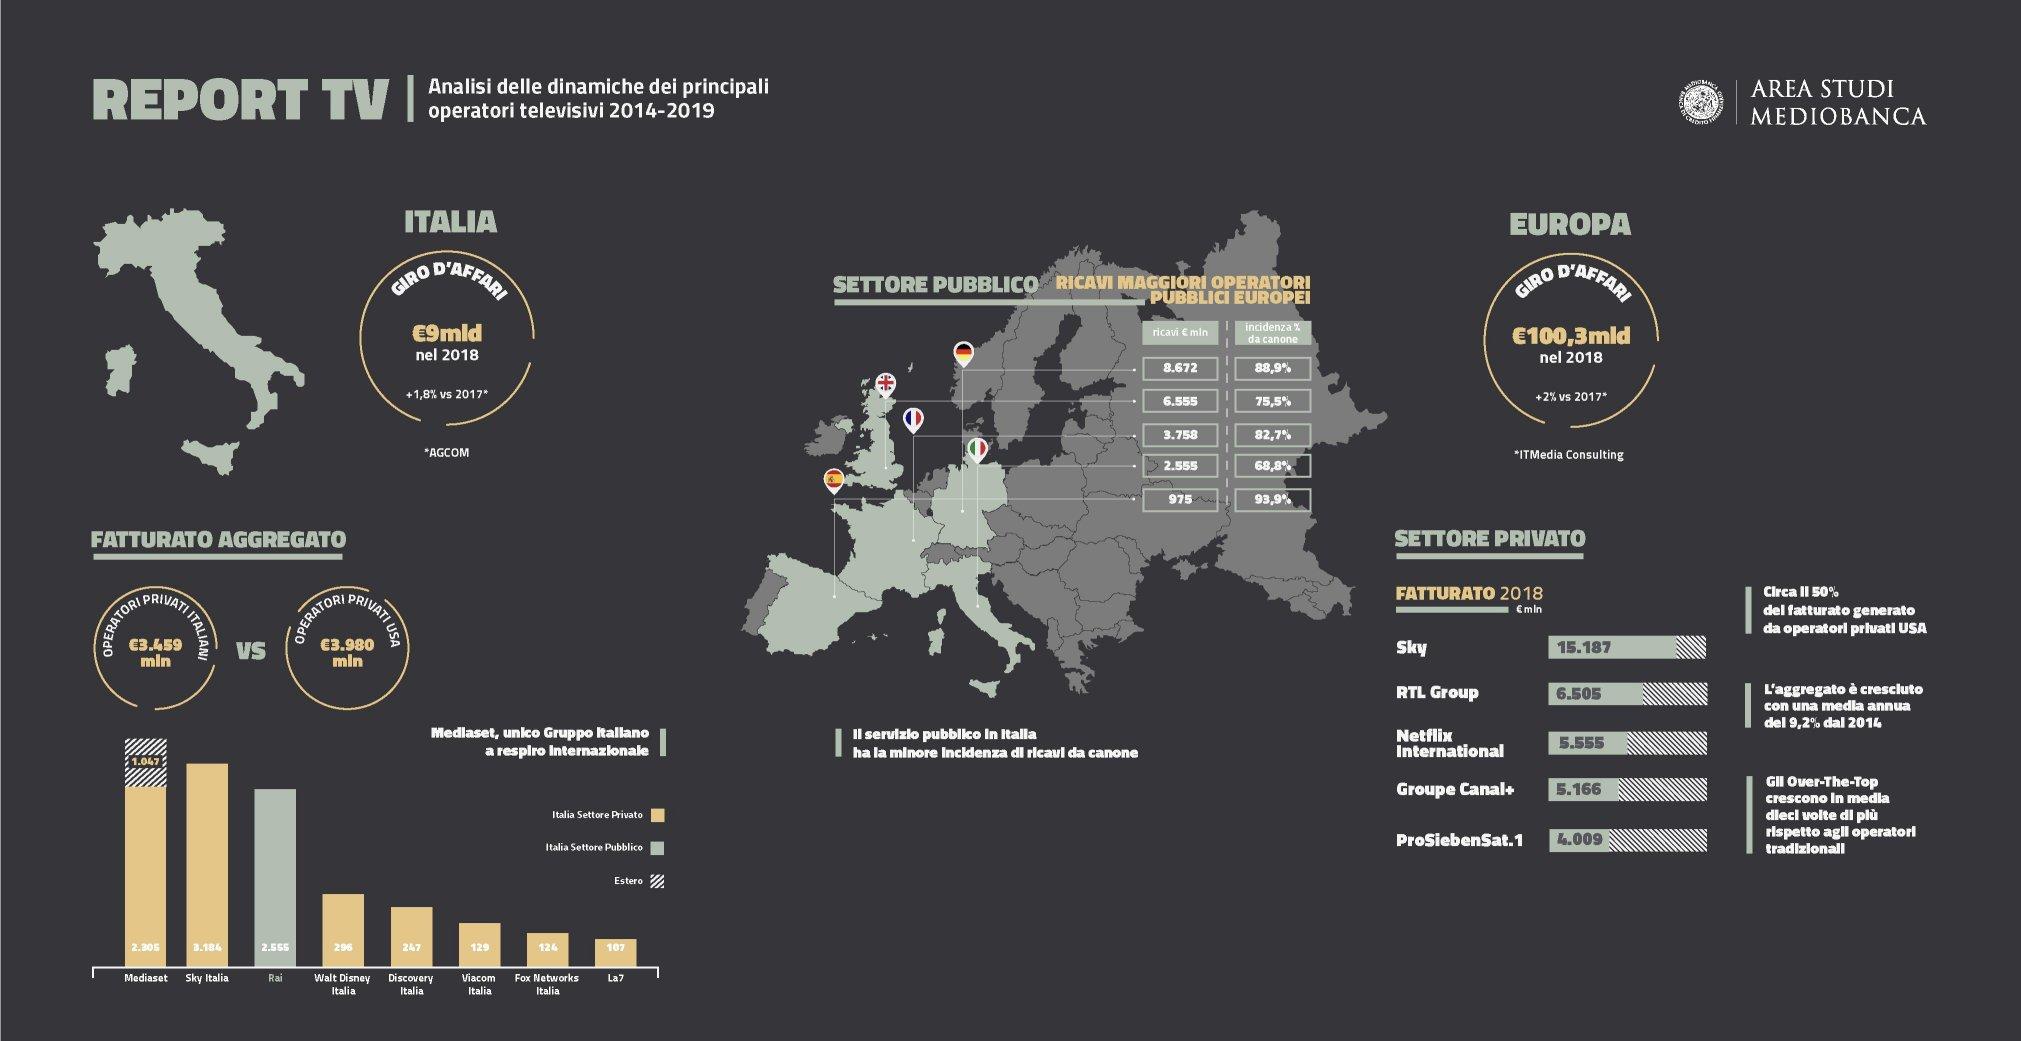 Area Studi Mediobanca, indagine sui principali operatori televisivi italiani